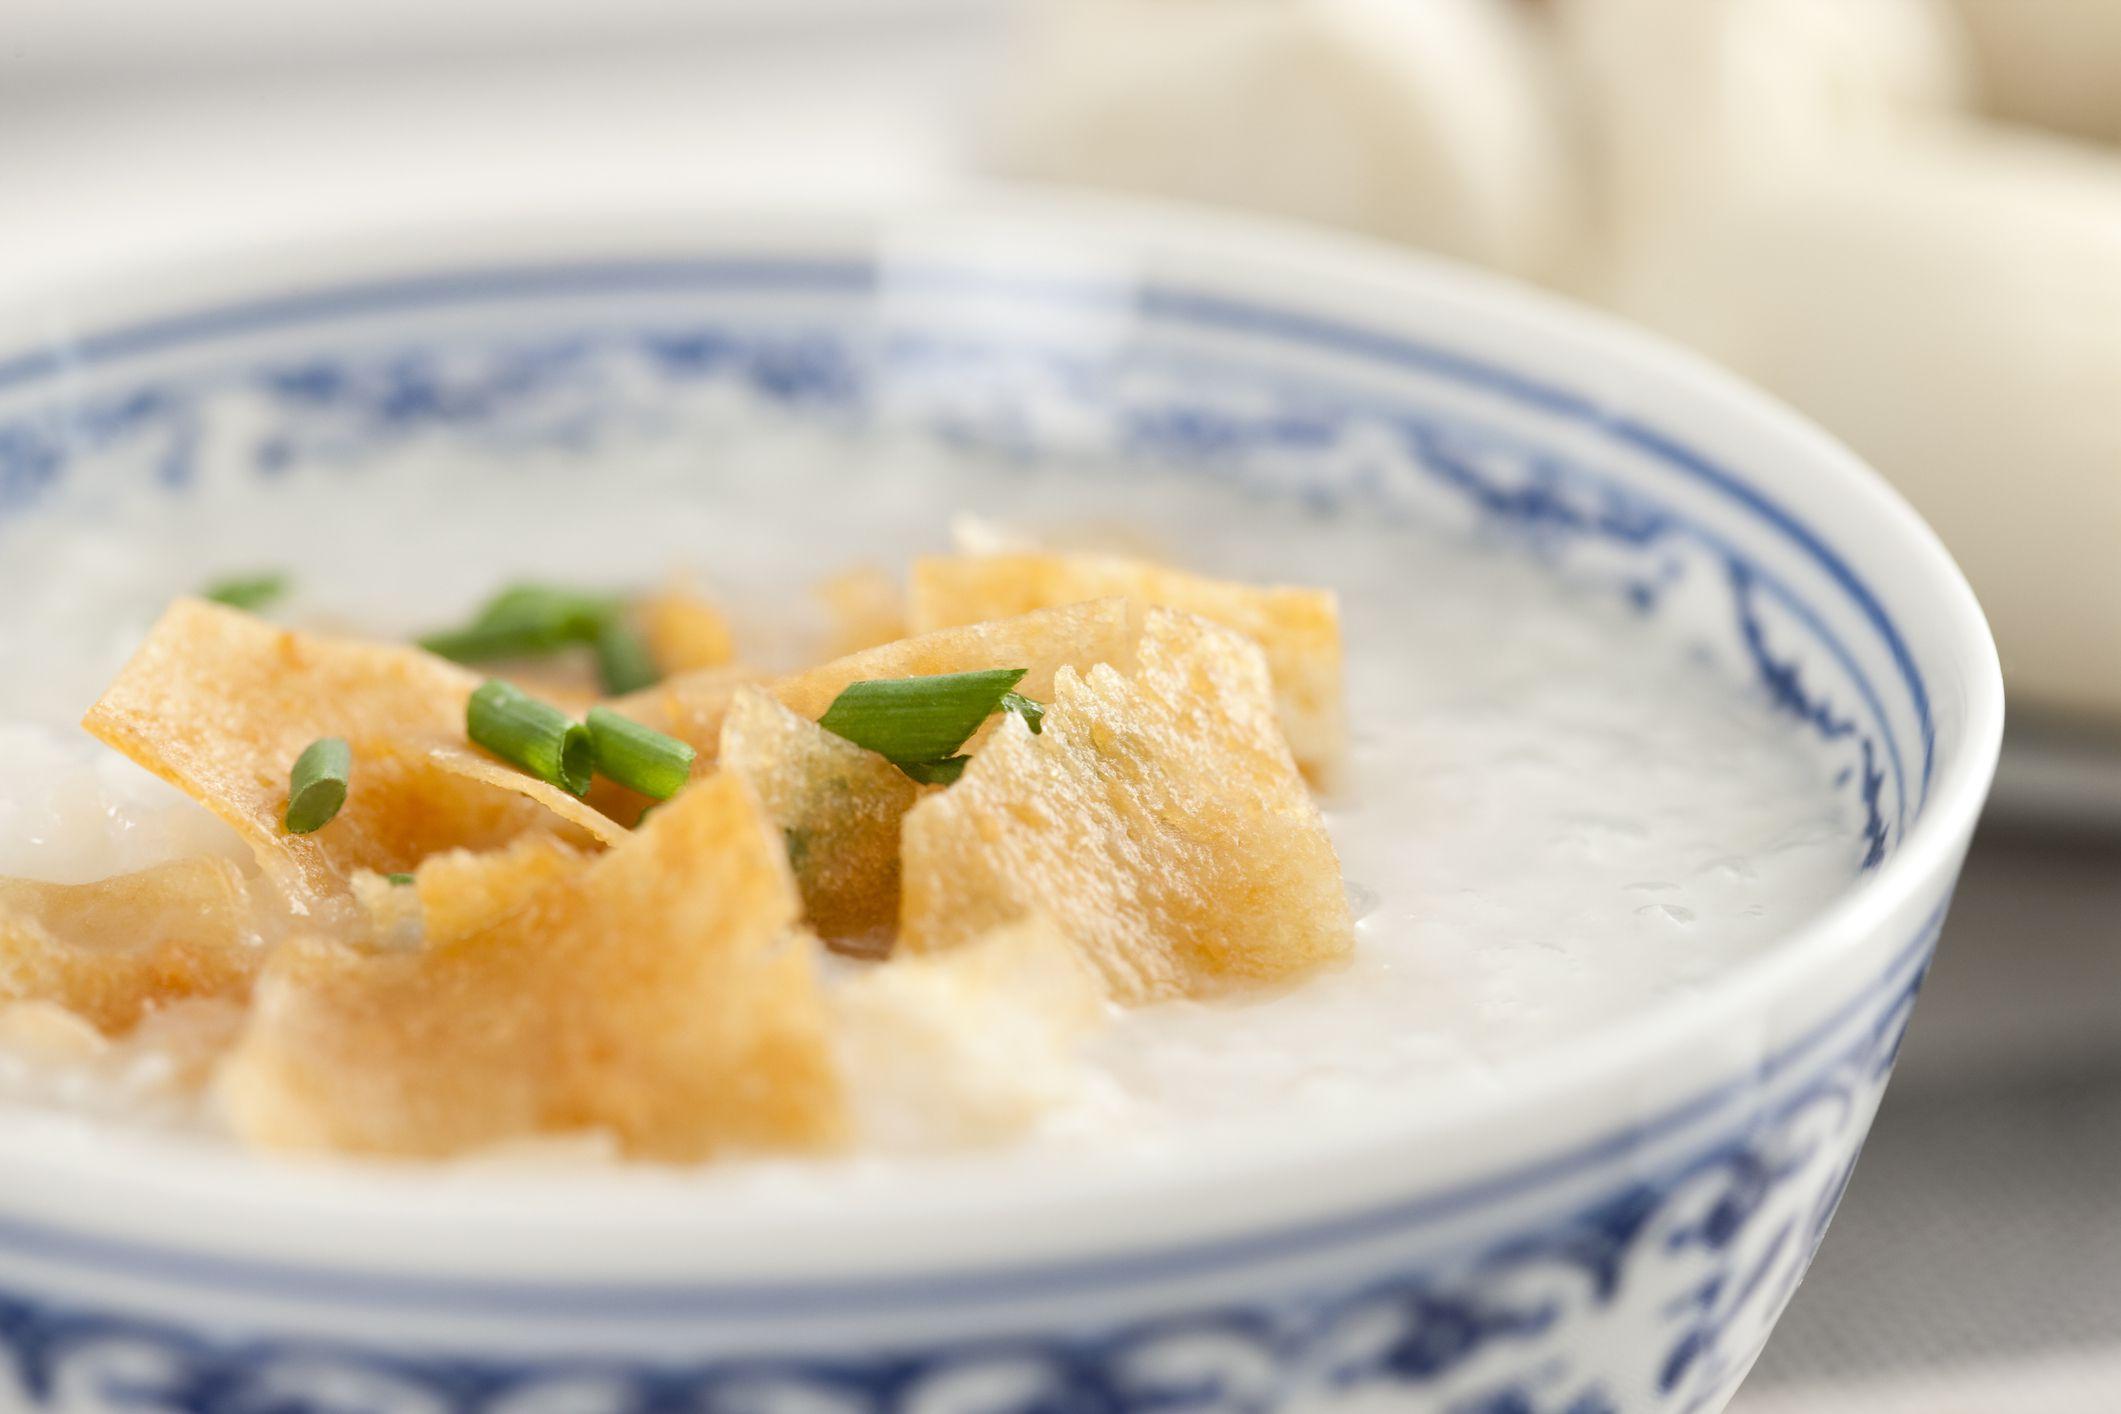 How to Make Congee (Chinese Rice Porridge)